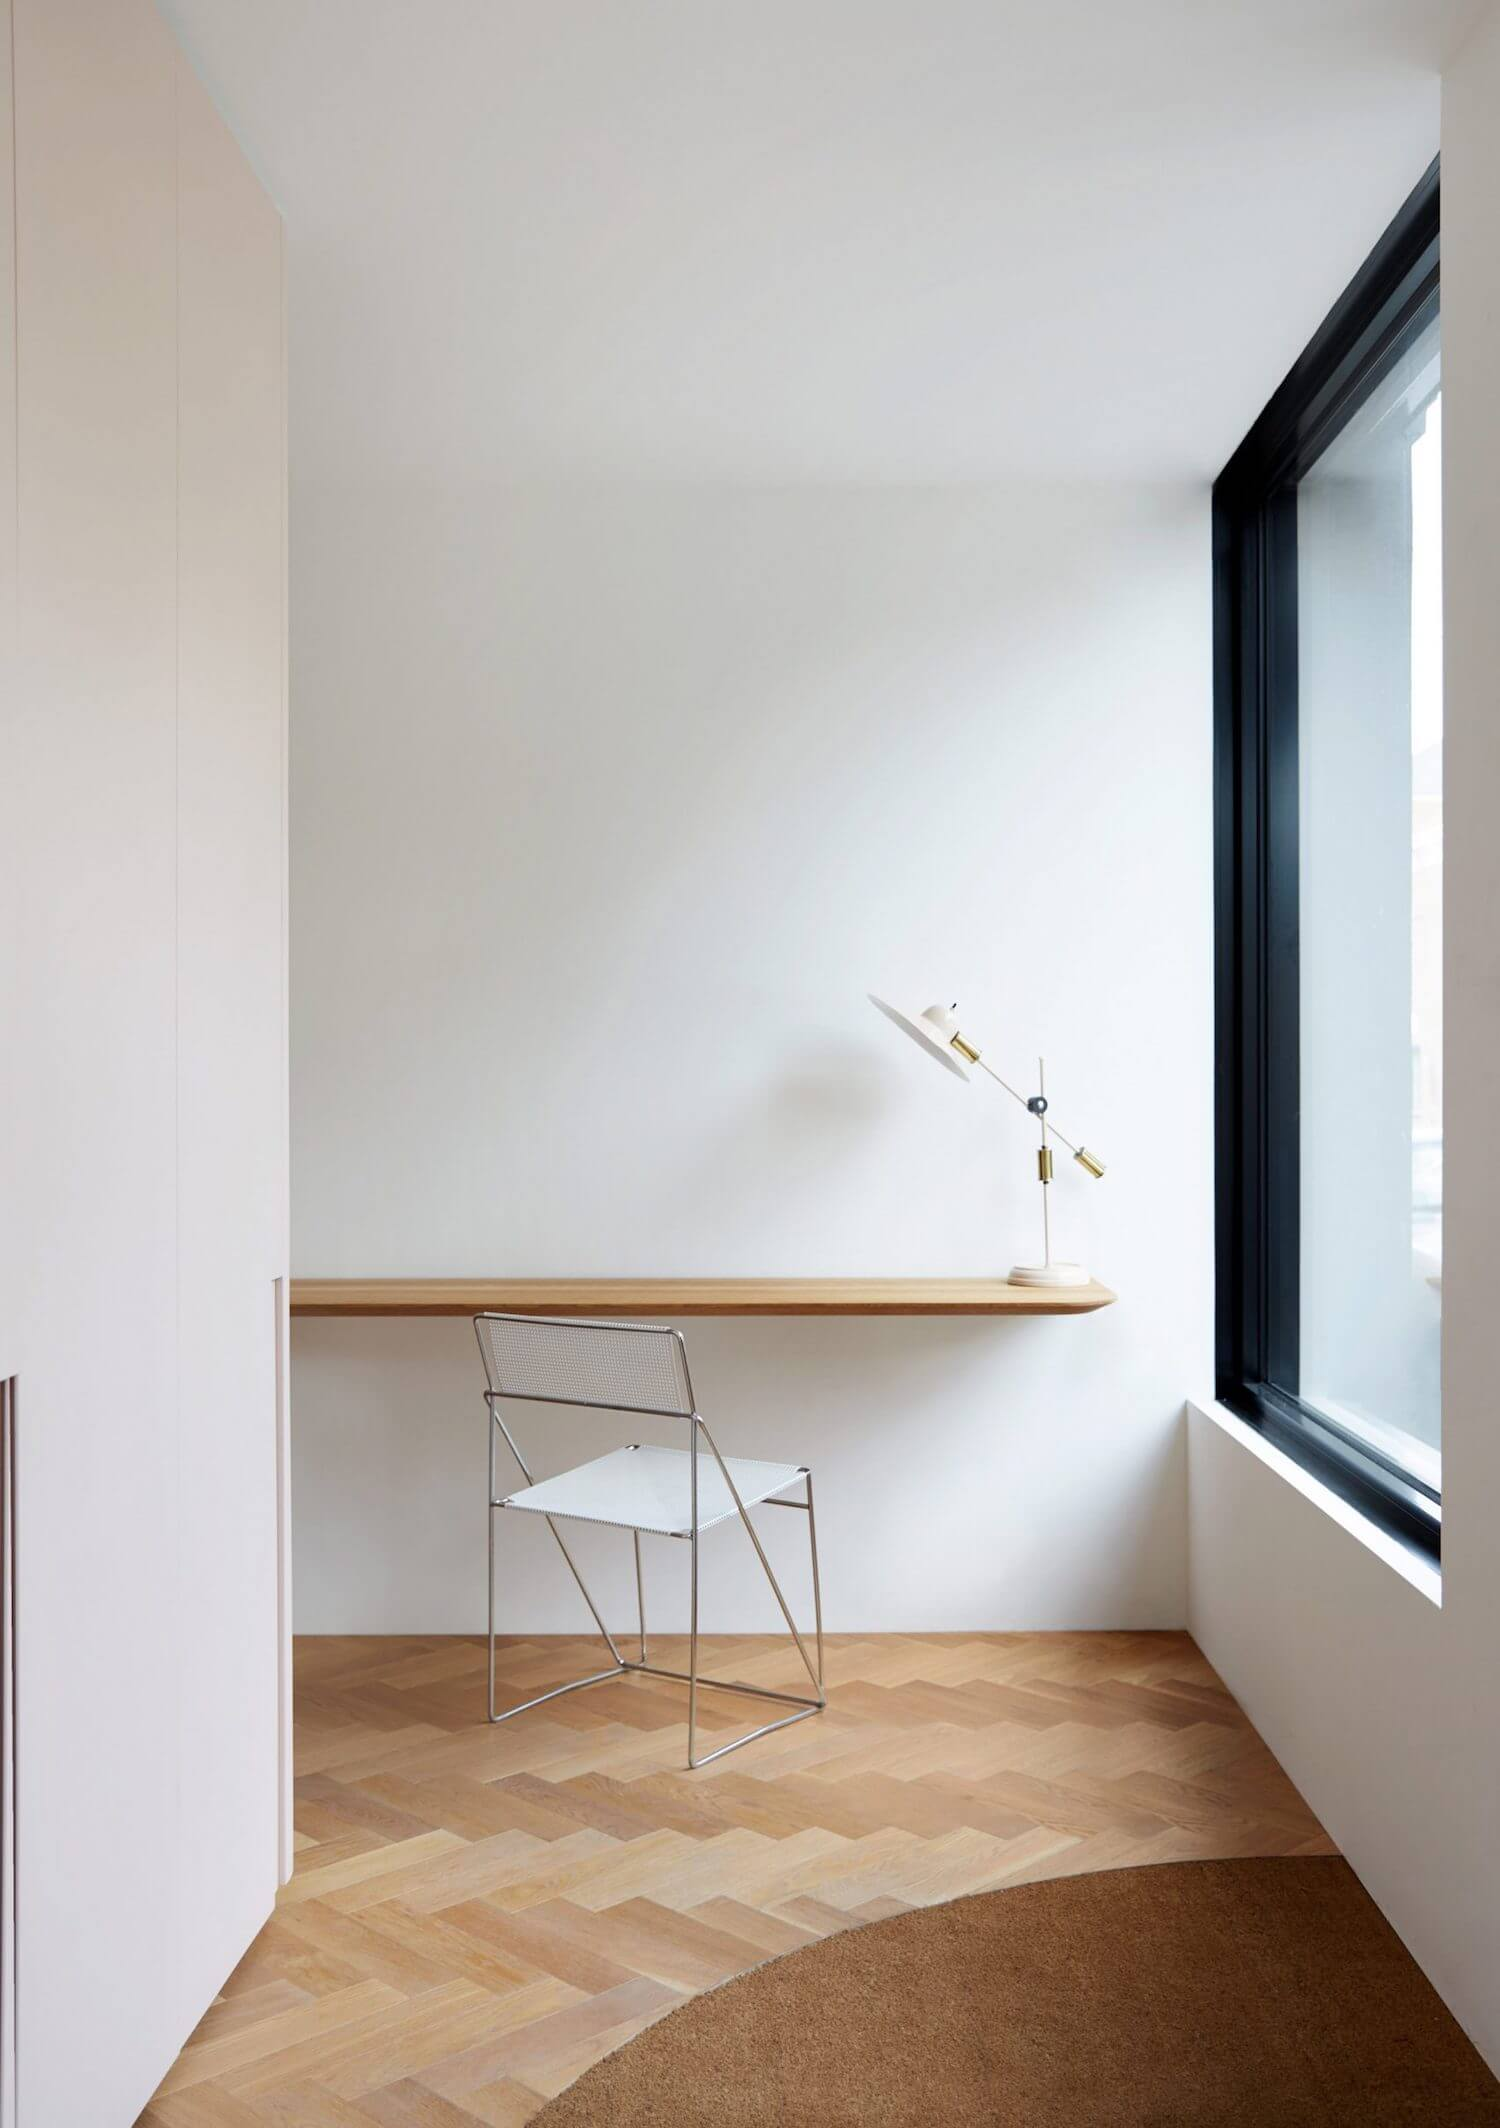 villeneuve residence atelier barda architecture interiors canada 1